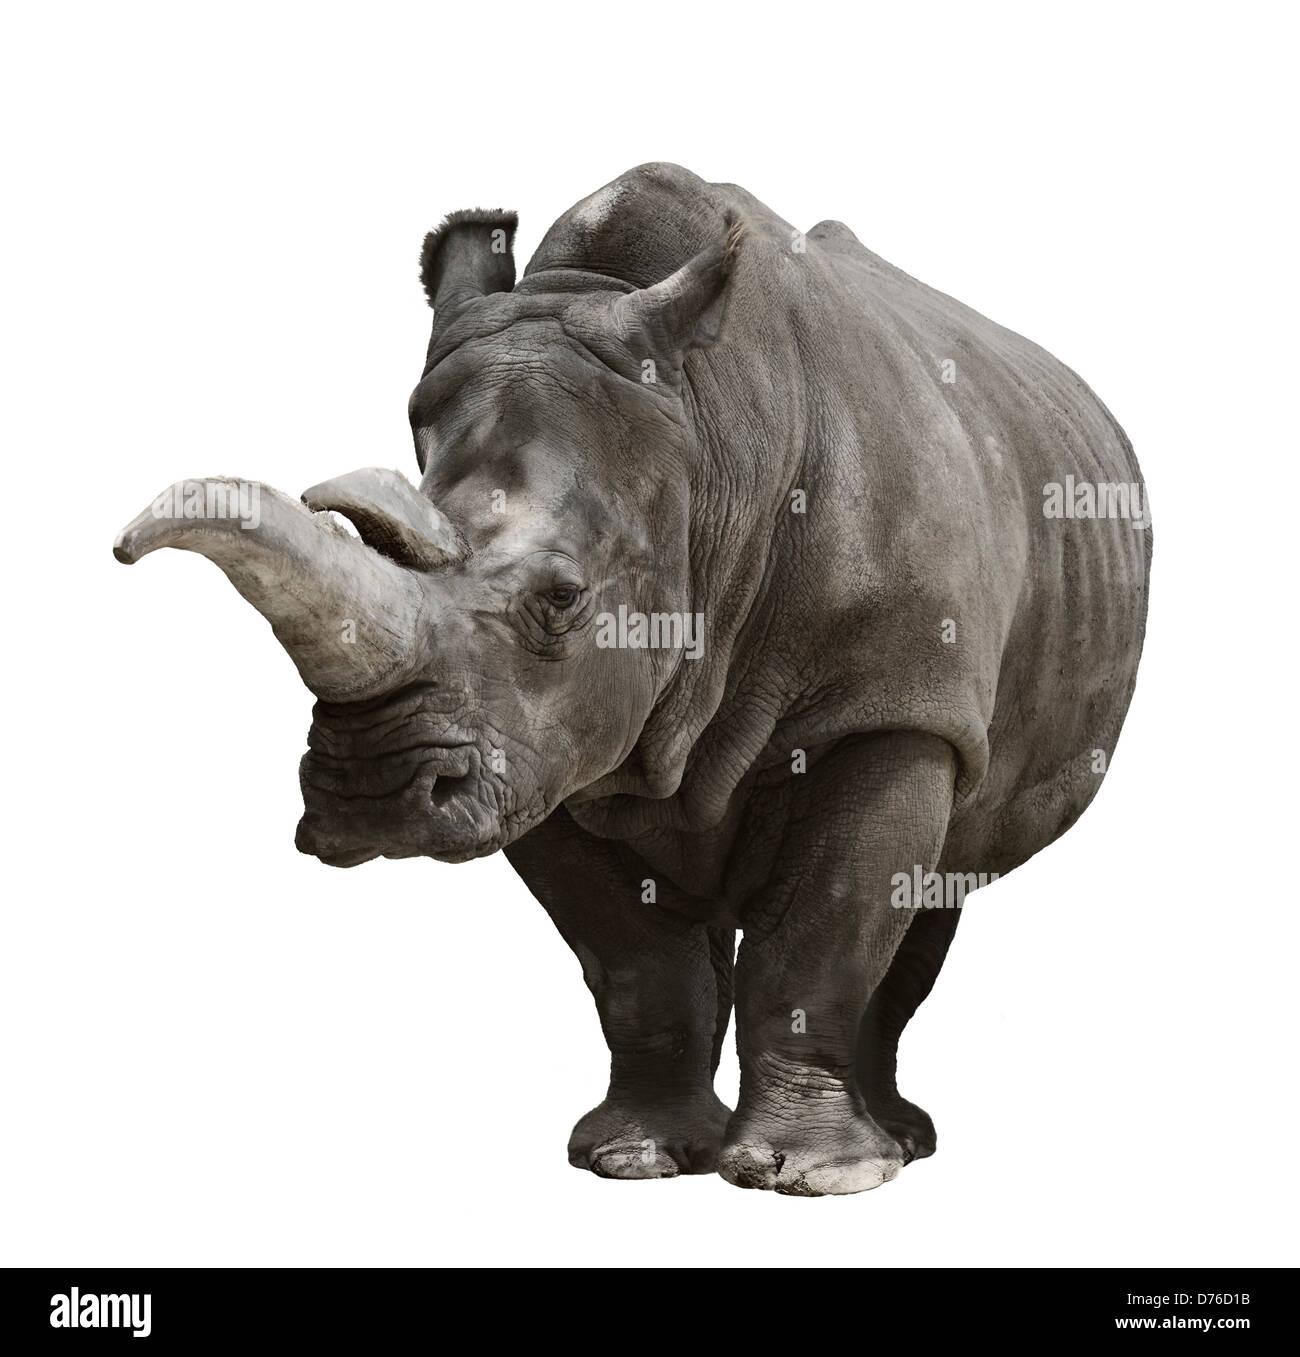 Portrait Of A Rhinoceros On White Background - Stock Image